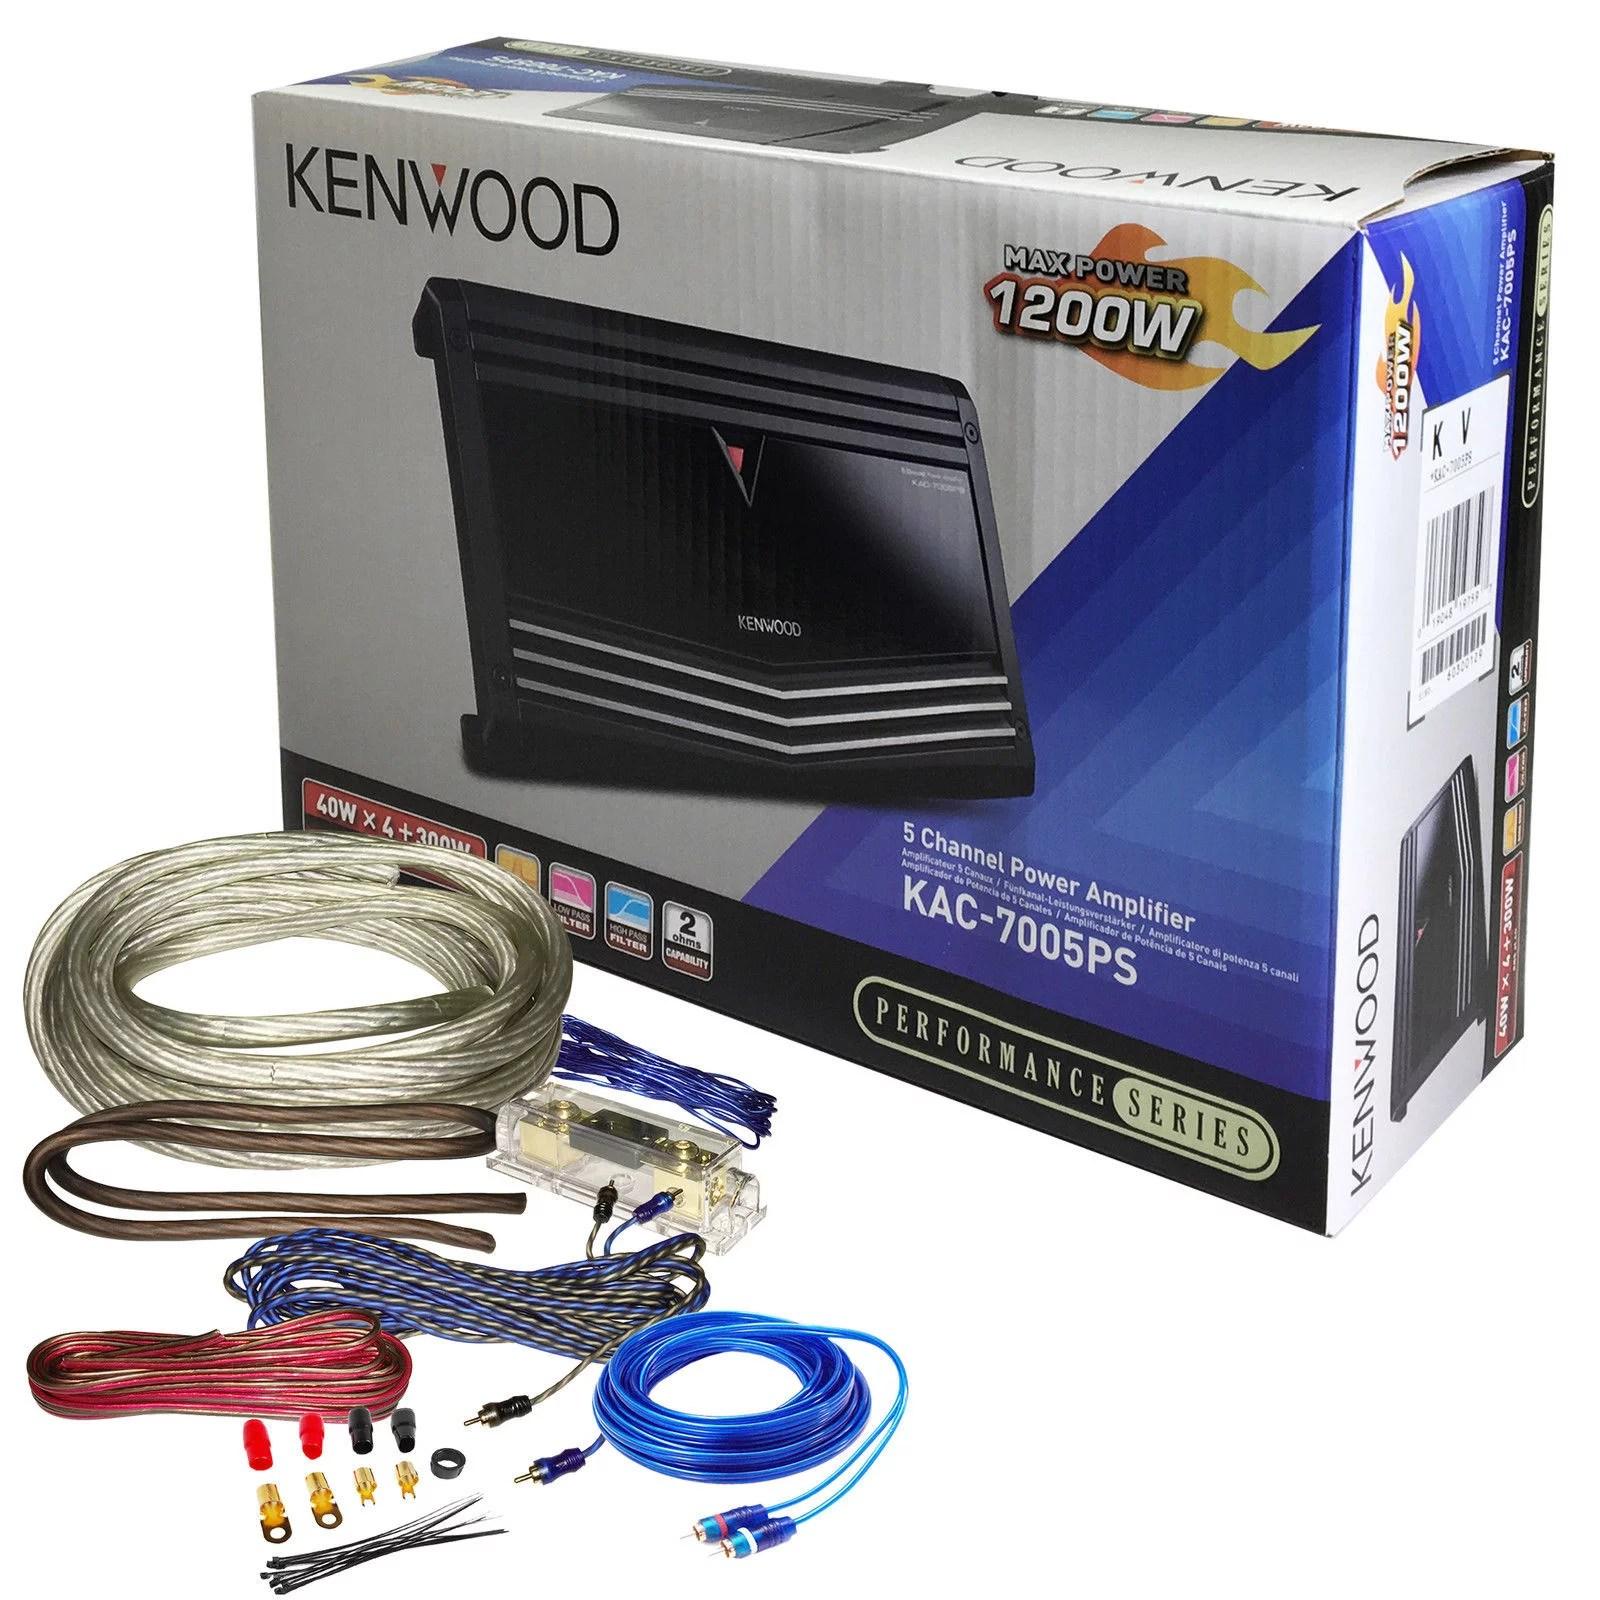 small resolution of kenwood kac 7005ps 700w rms 5 channel car amplifier 1200w w wiringkenwood kac 7005ps 700w rms